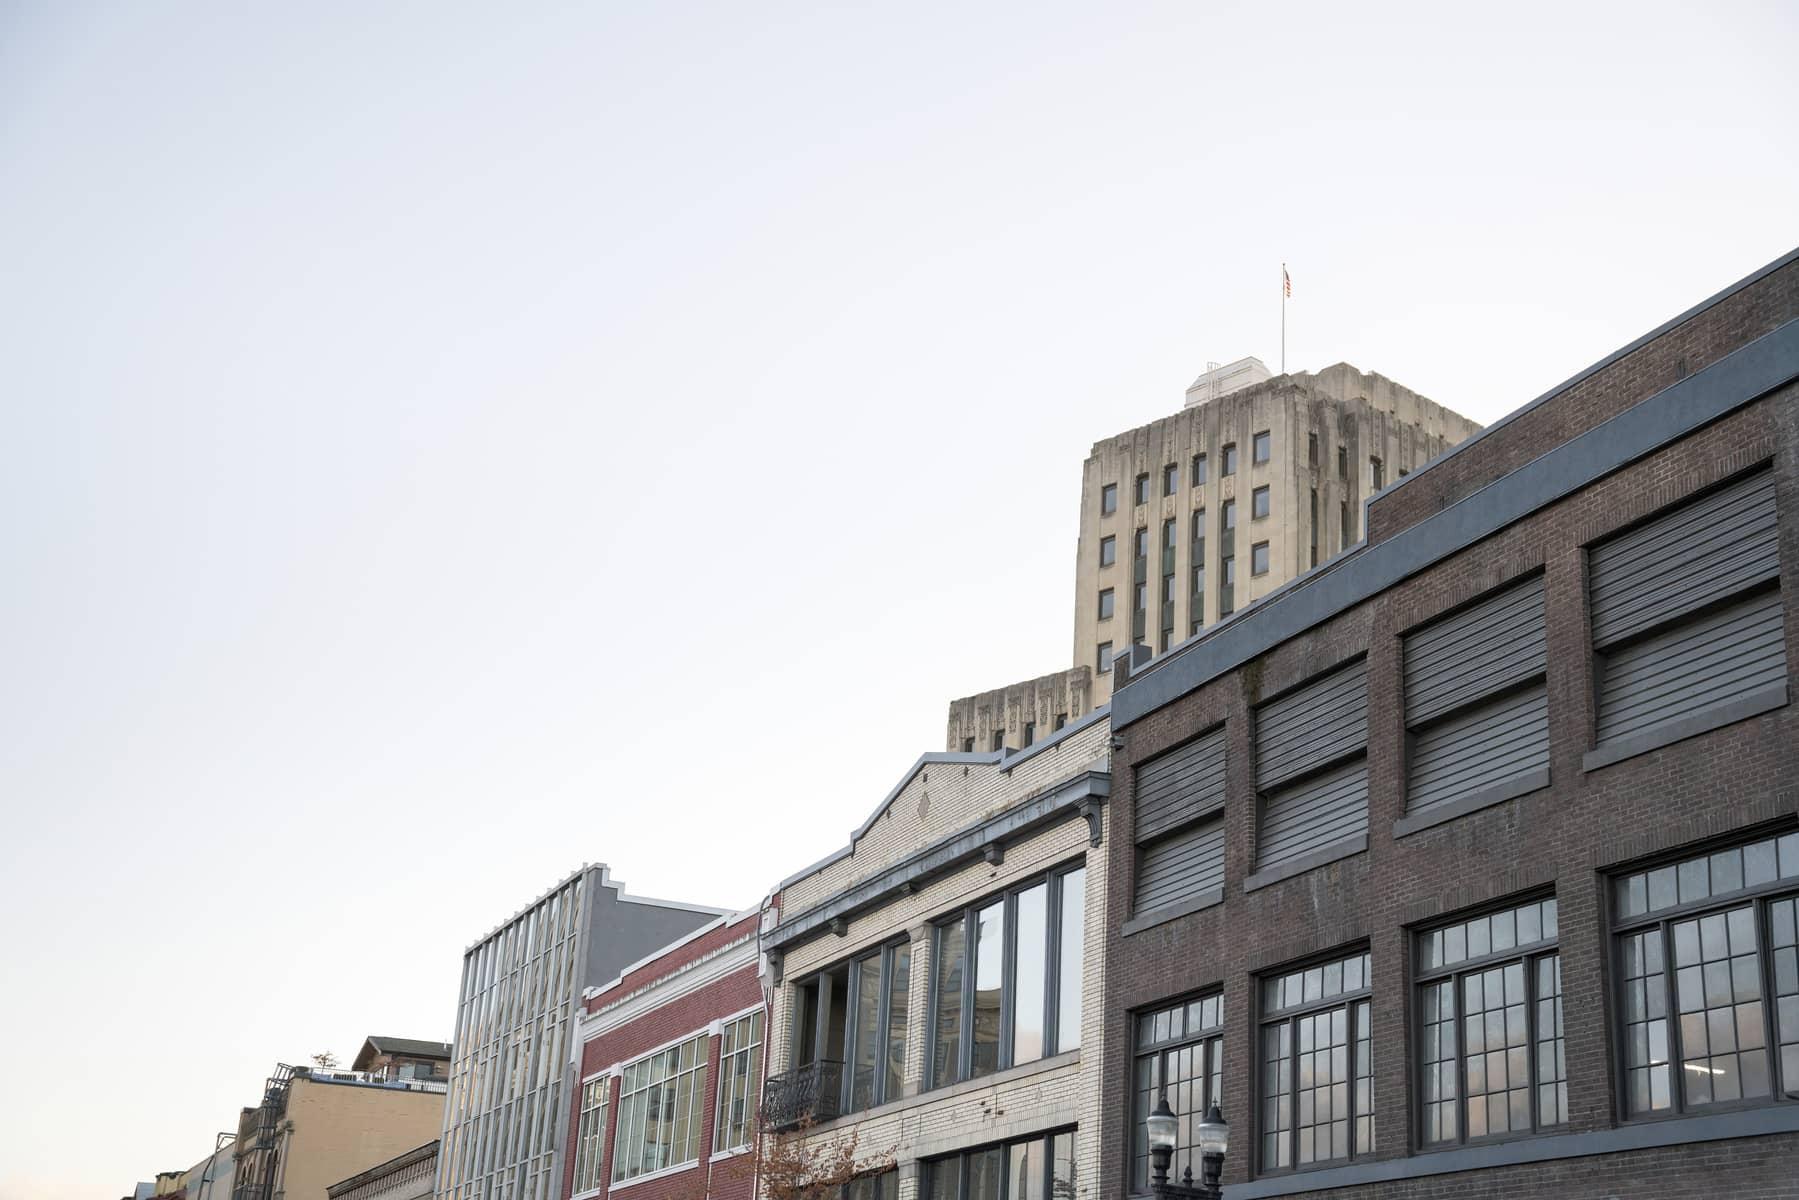 Commercial Buildings in Lakewood, WA